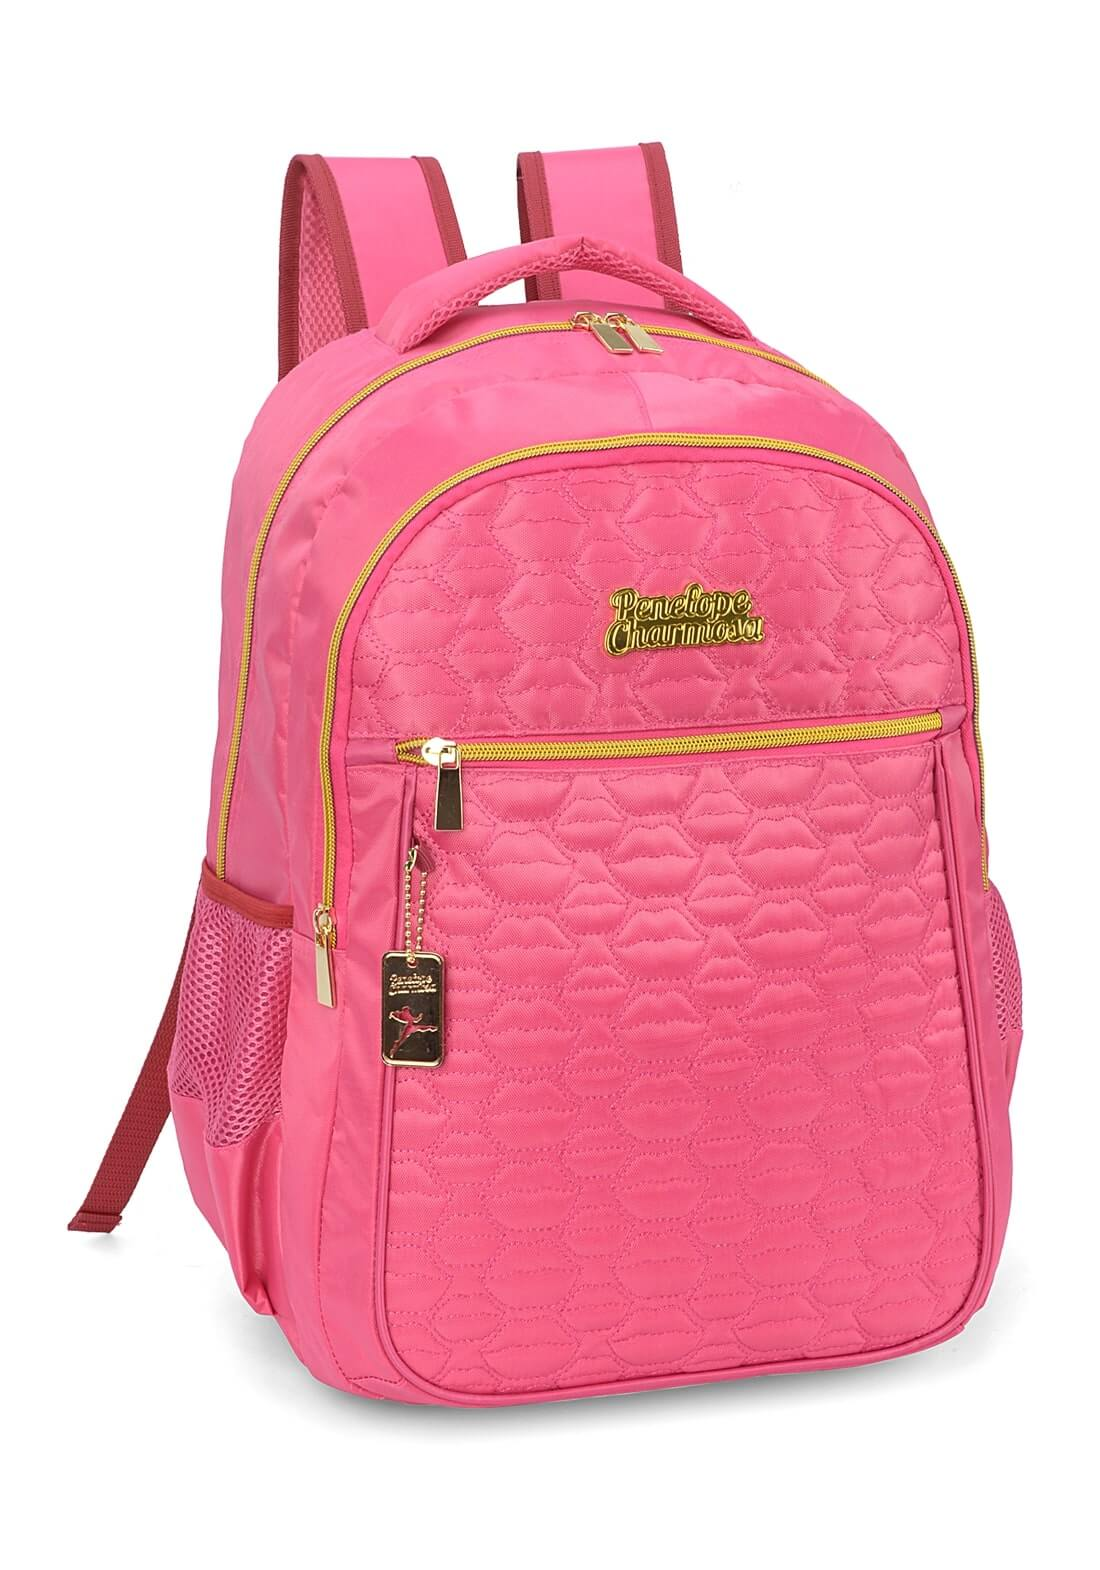 Mochila Notebook Penelope Charmosa Costas Pink Original NF